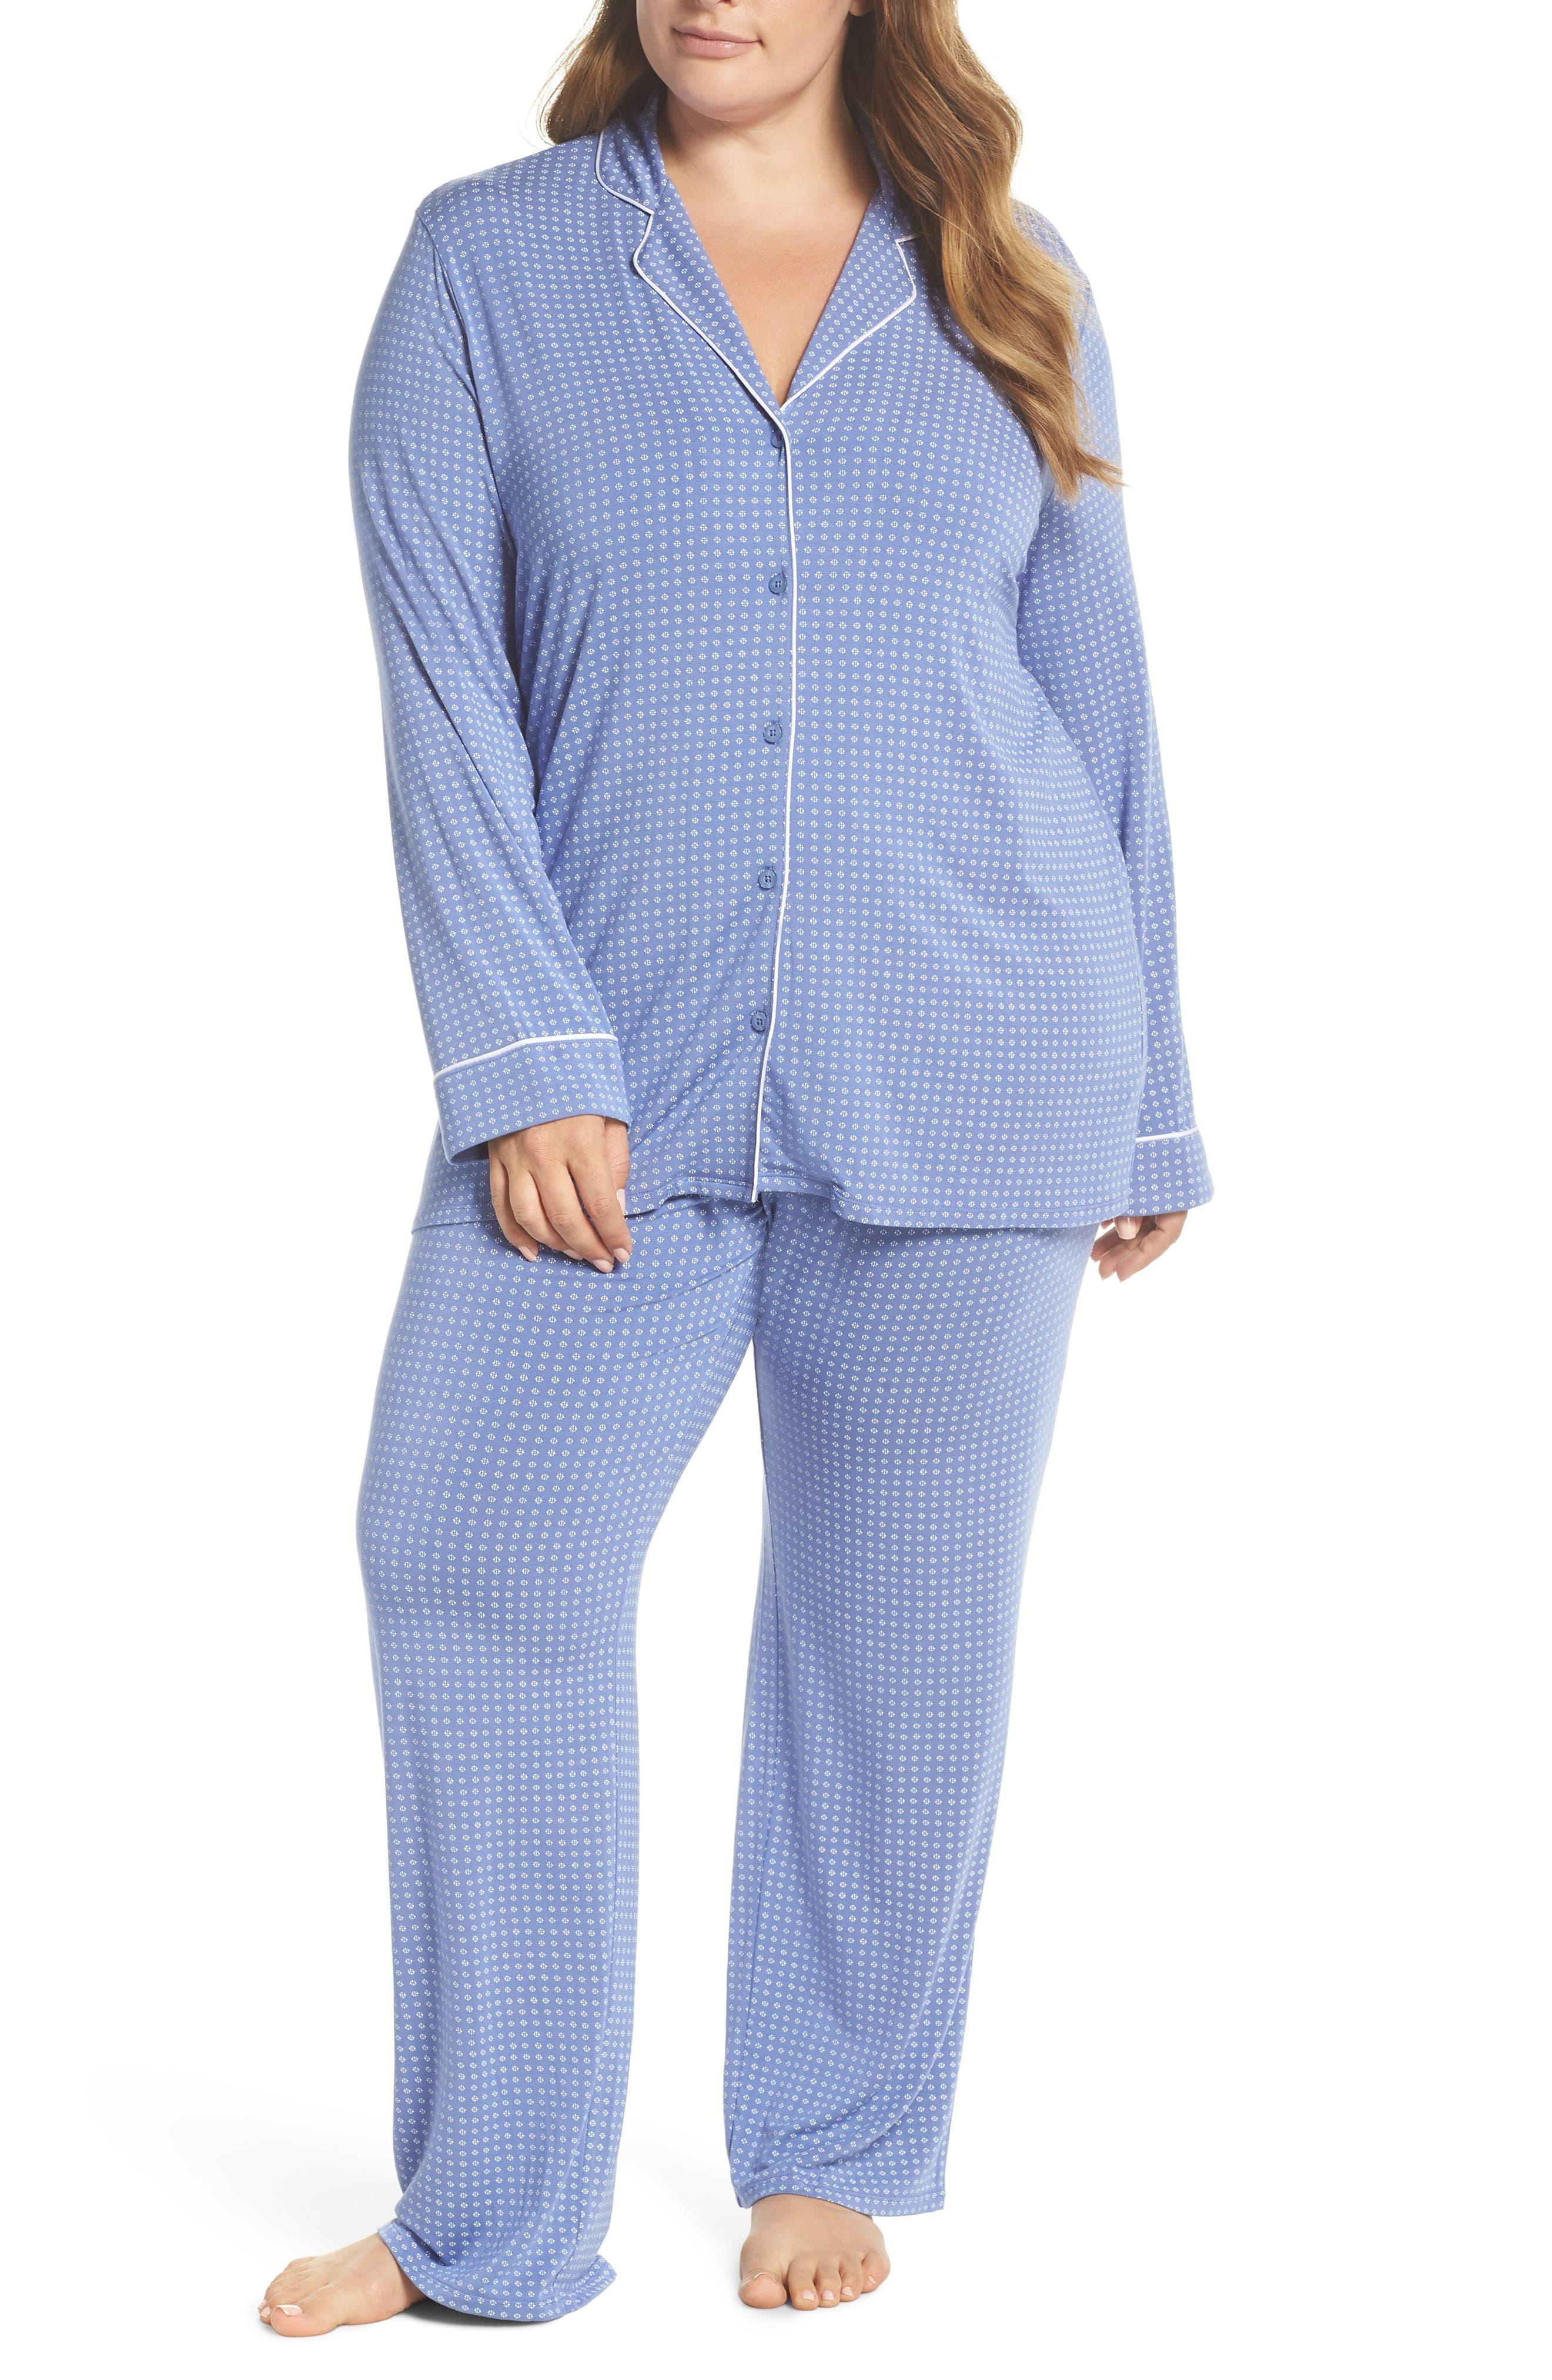 'Moonlight' Pajamas,                             Main thumbnail 1, color,                             Blue Denim Geo